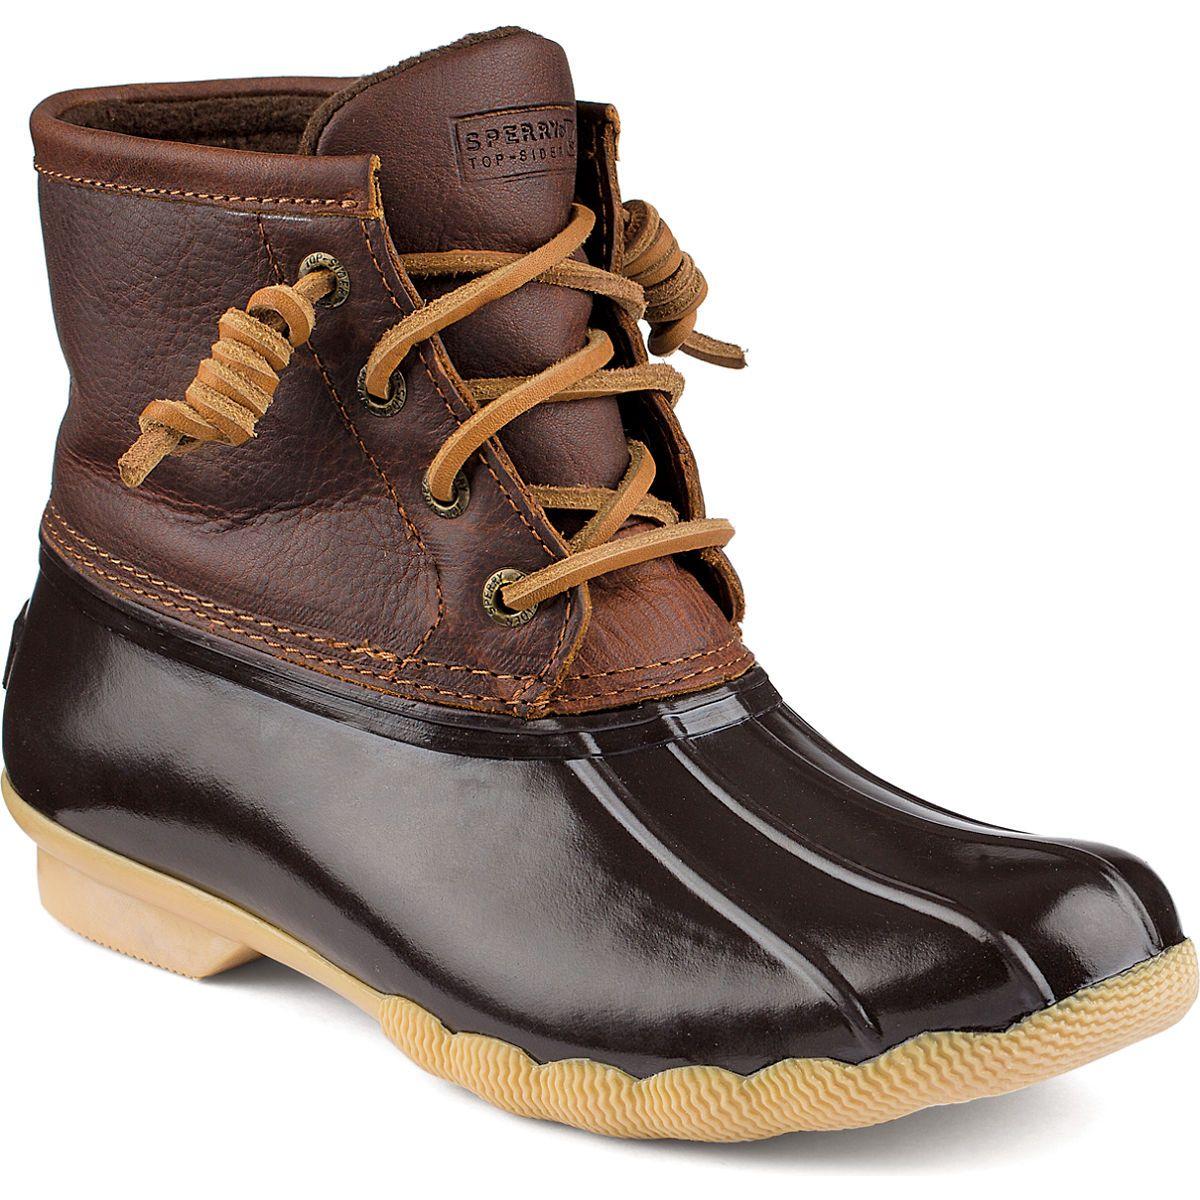 Saltwater Duck Boot   Sperry duck boots